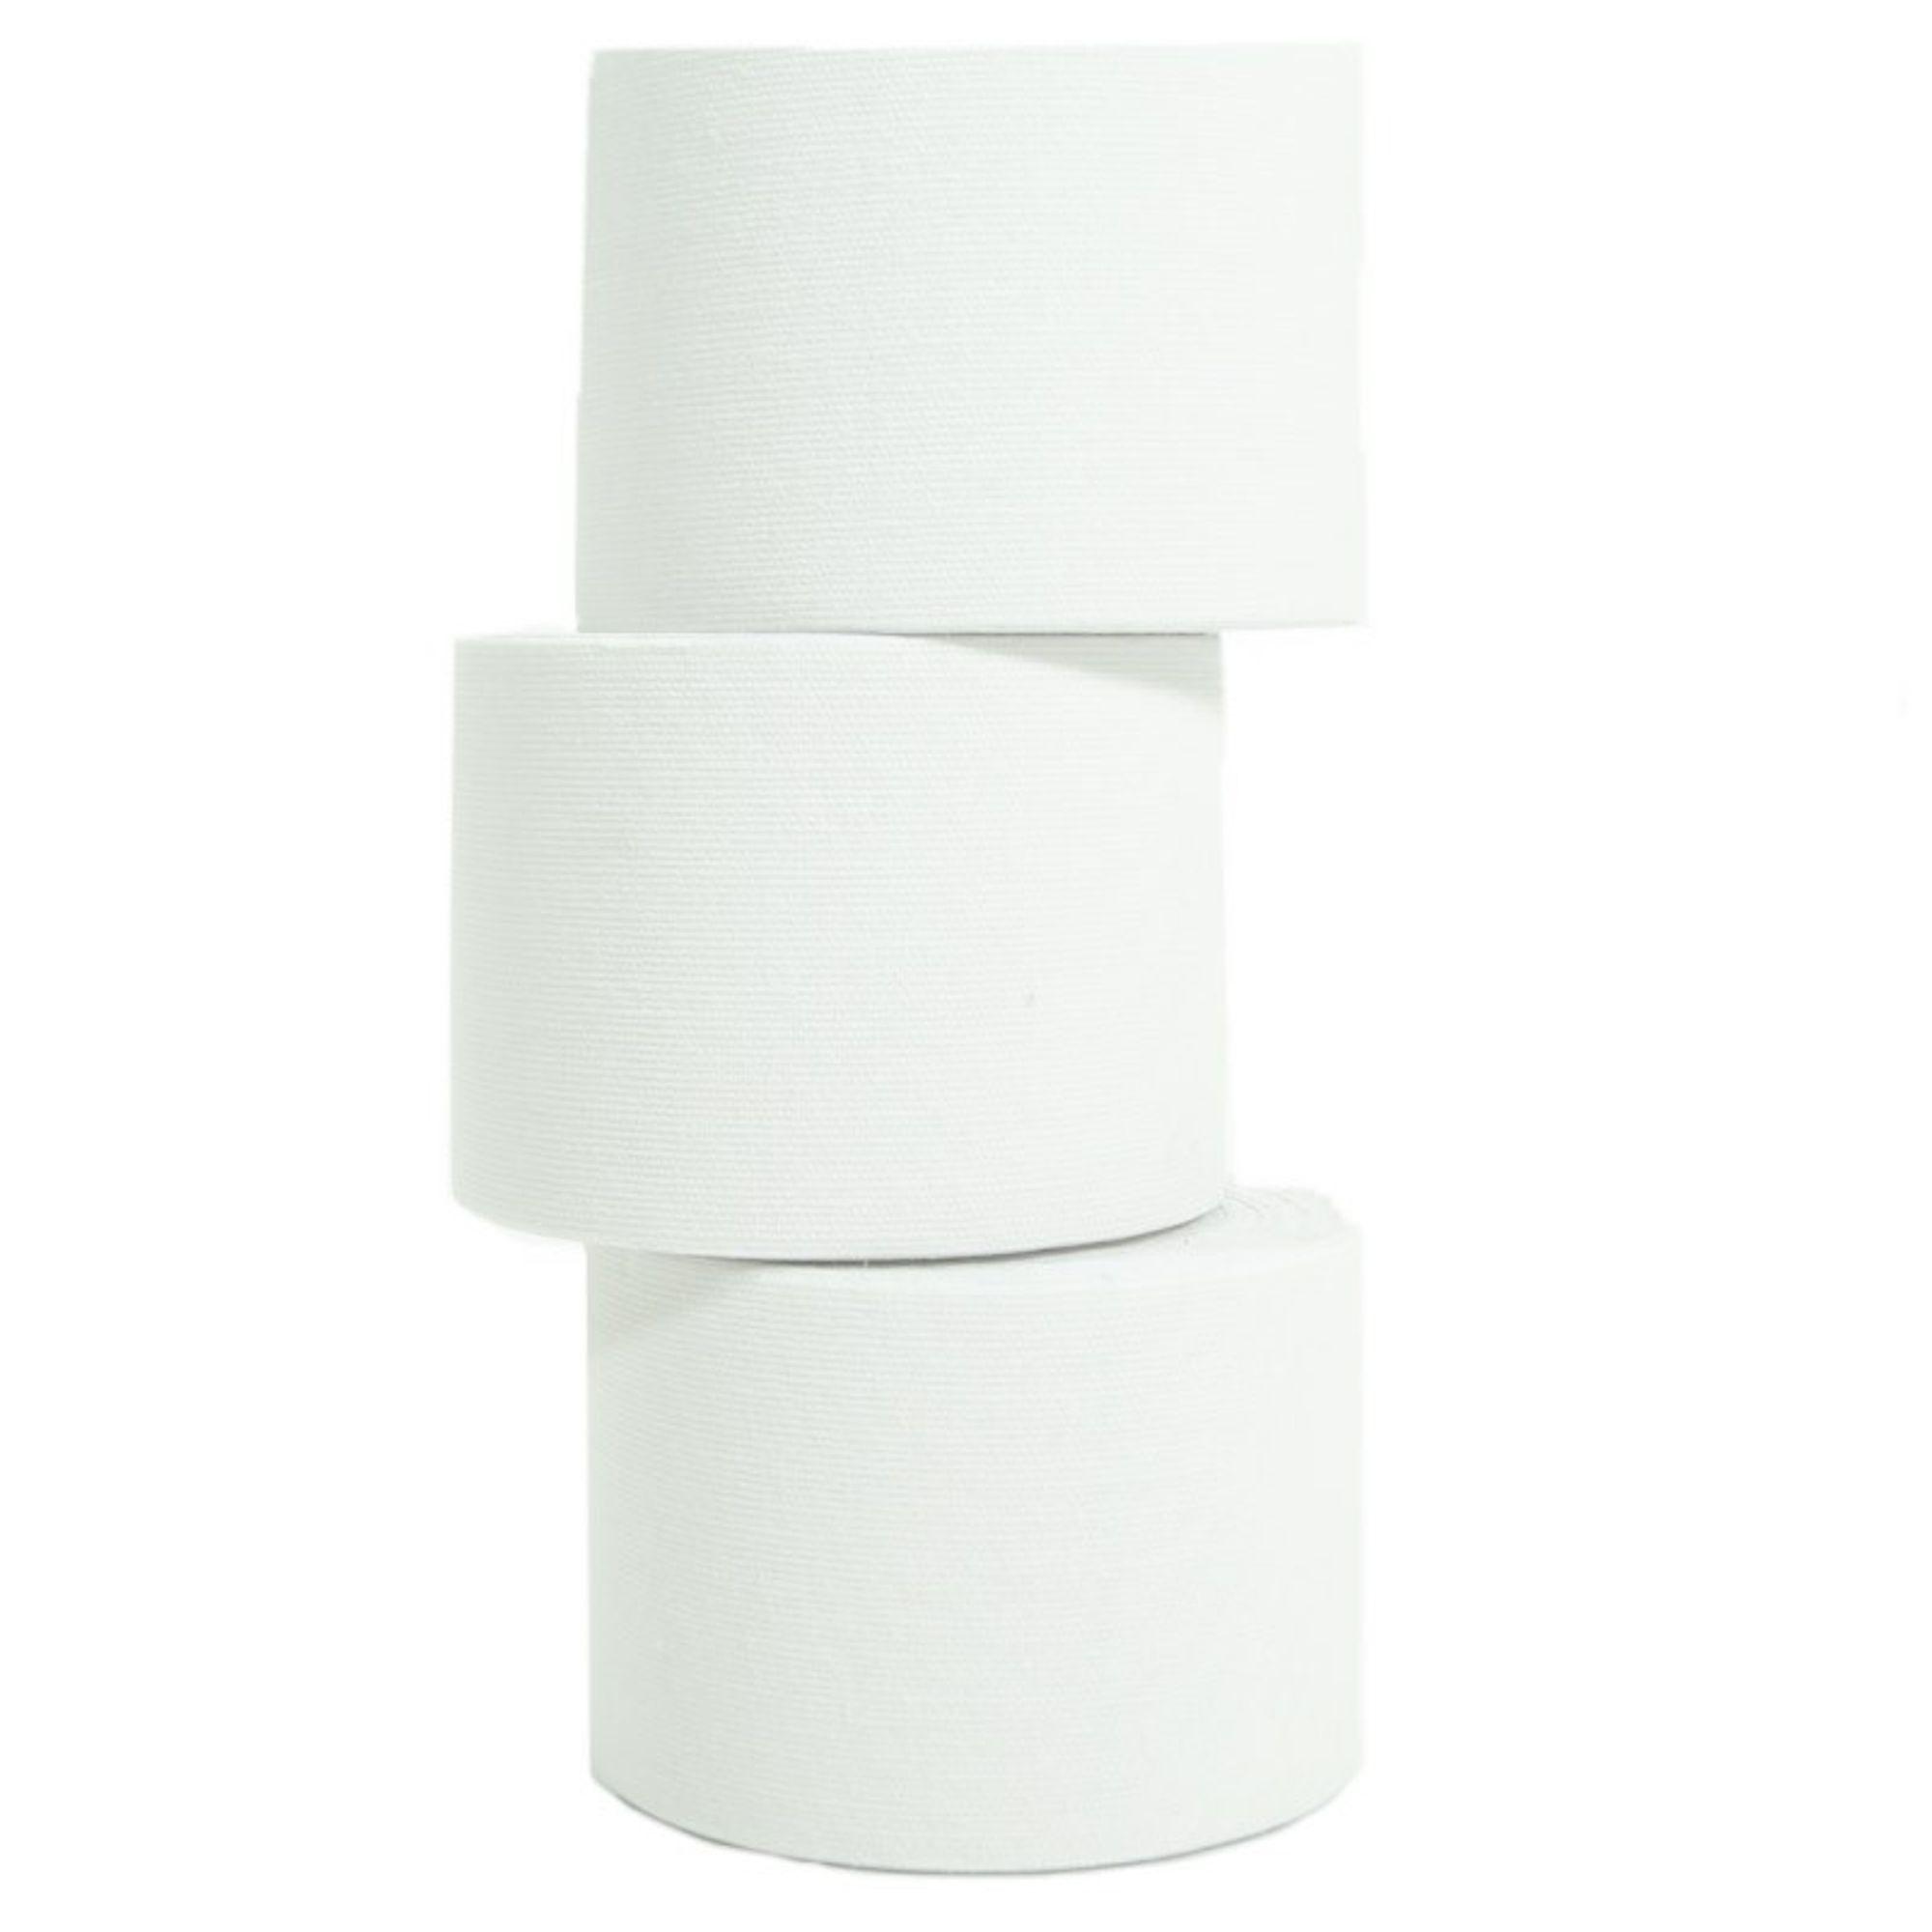 1 Rolle Kinesiologie Tape 5 m x 5,0 cm weiß